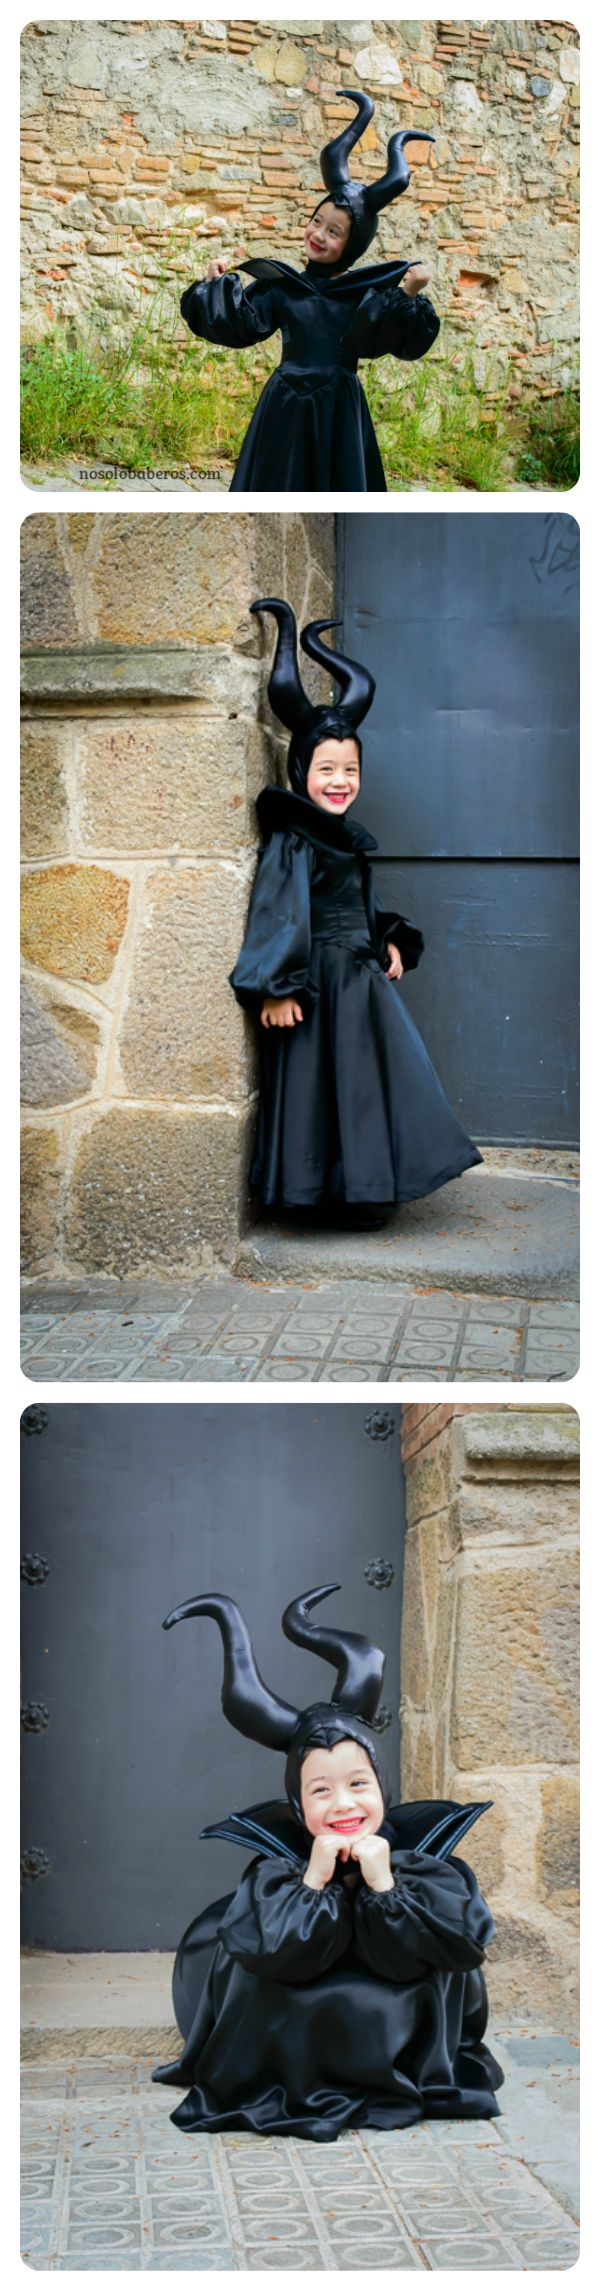 Disfraz infantil de Malefica #Maleficent #carnaval #lovely #nosolobaberos